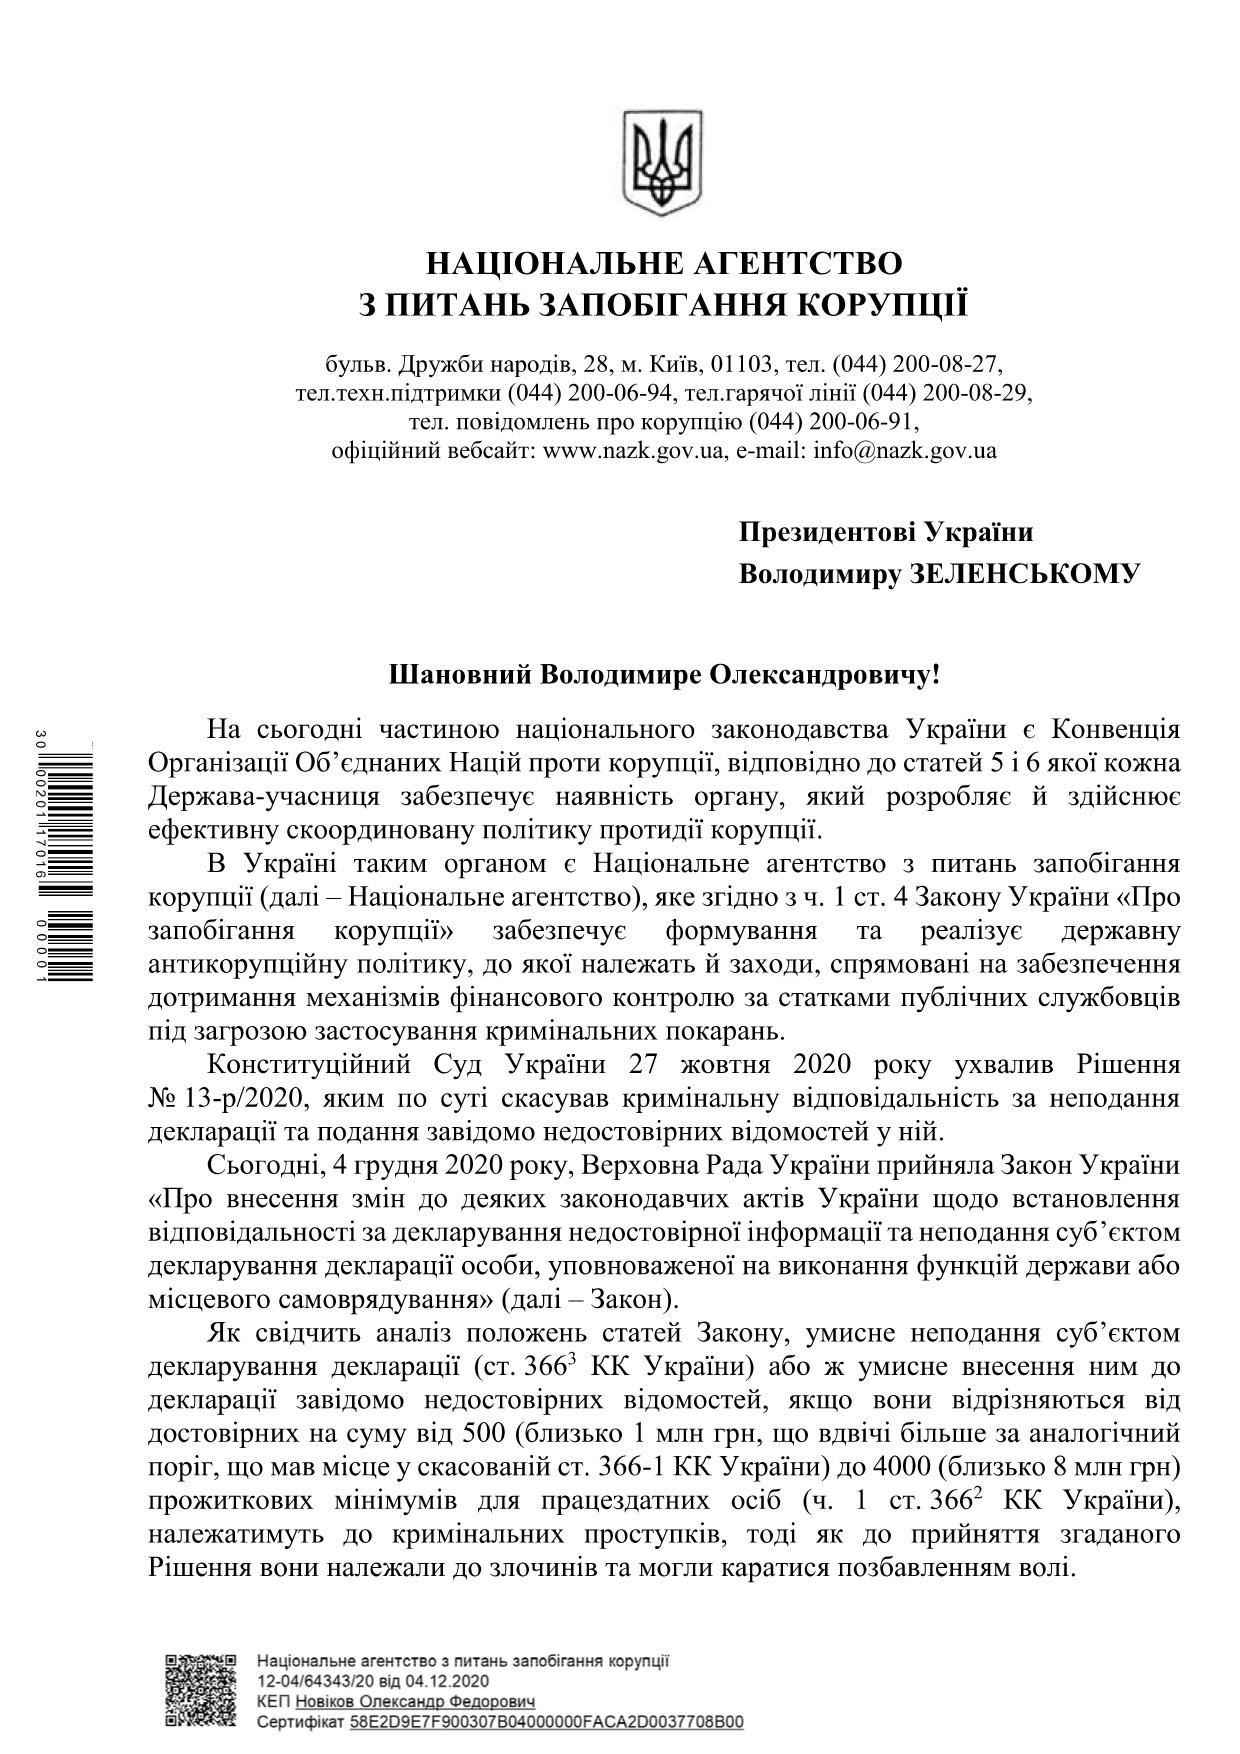 Письмо главы НАПК Александра Новикова президенту Владимиру Зеленскому